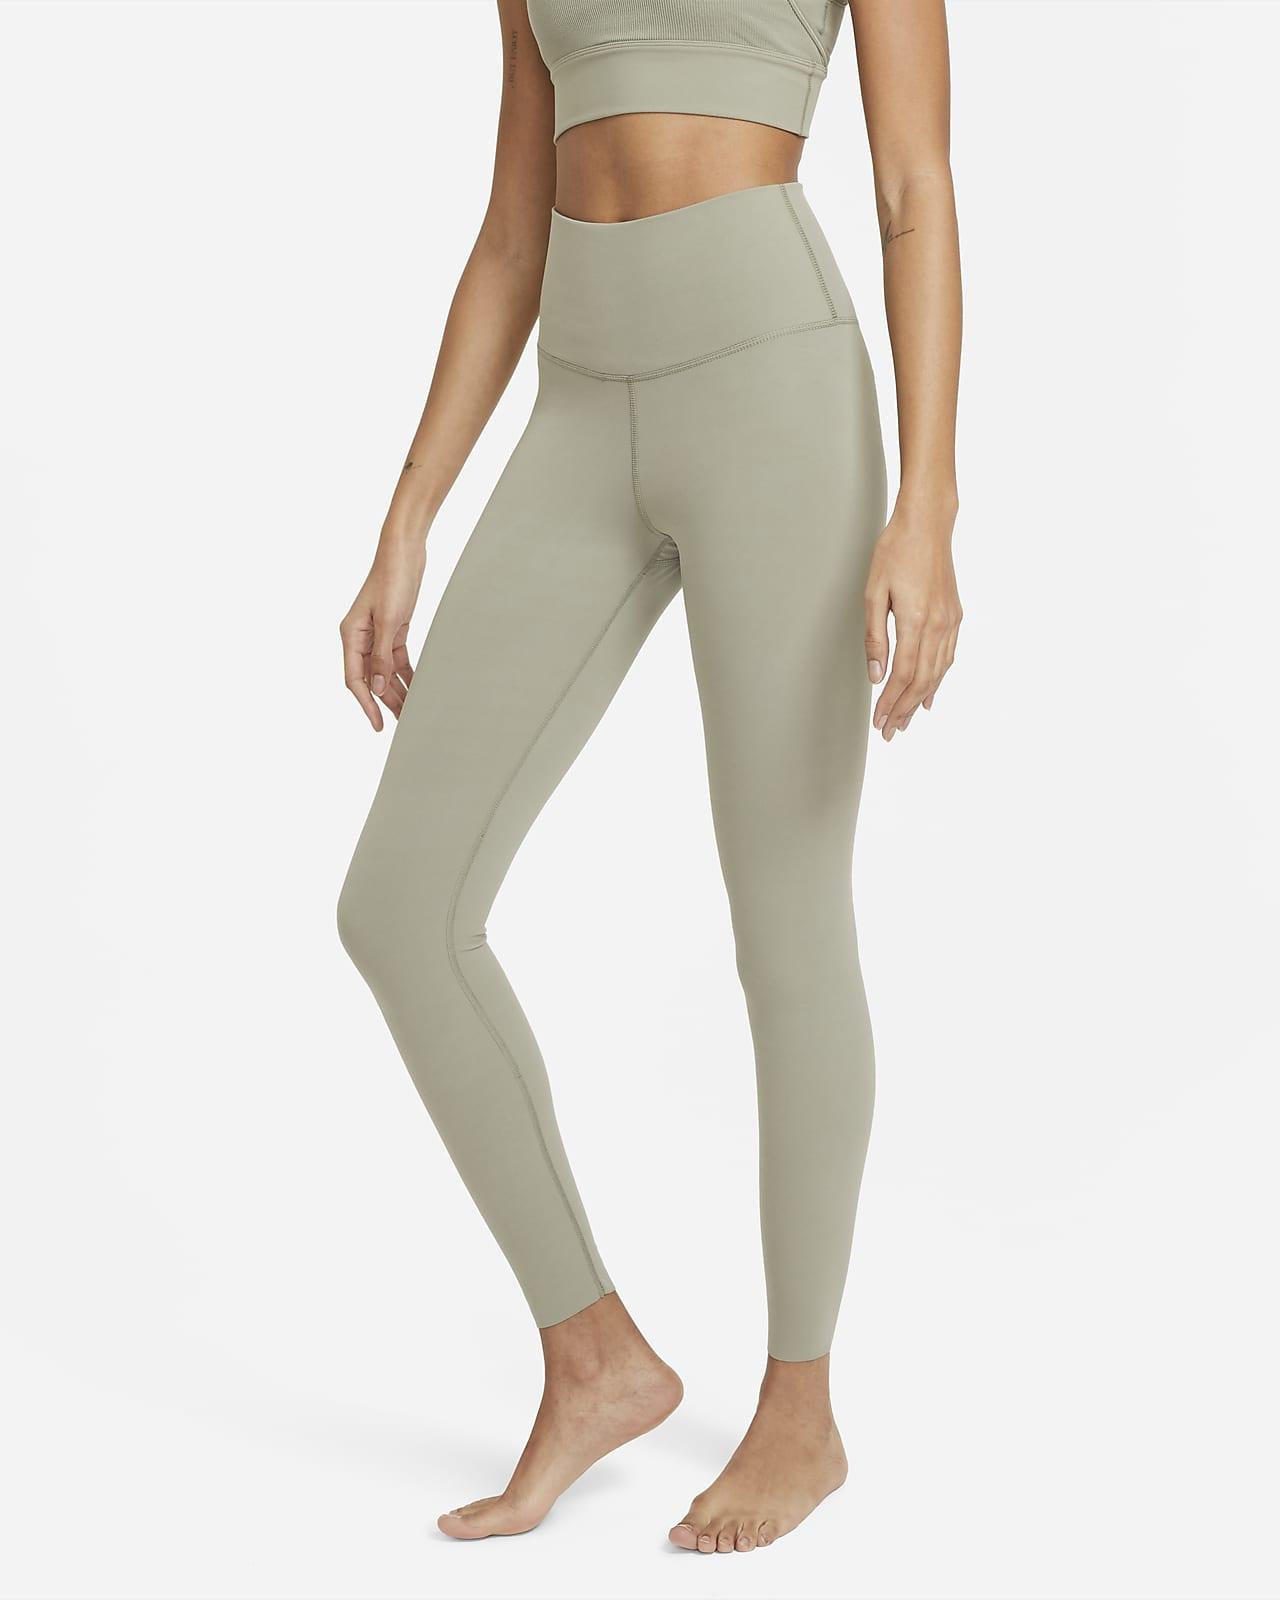 Leggings de cintura alta para mujer Nike Yoga Luxe